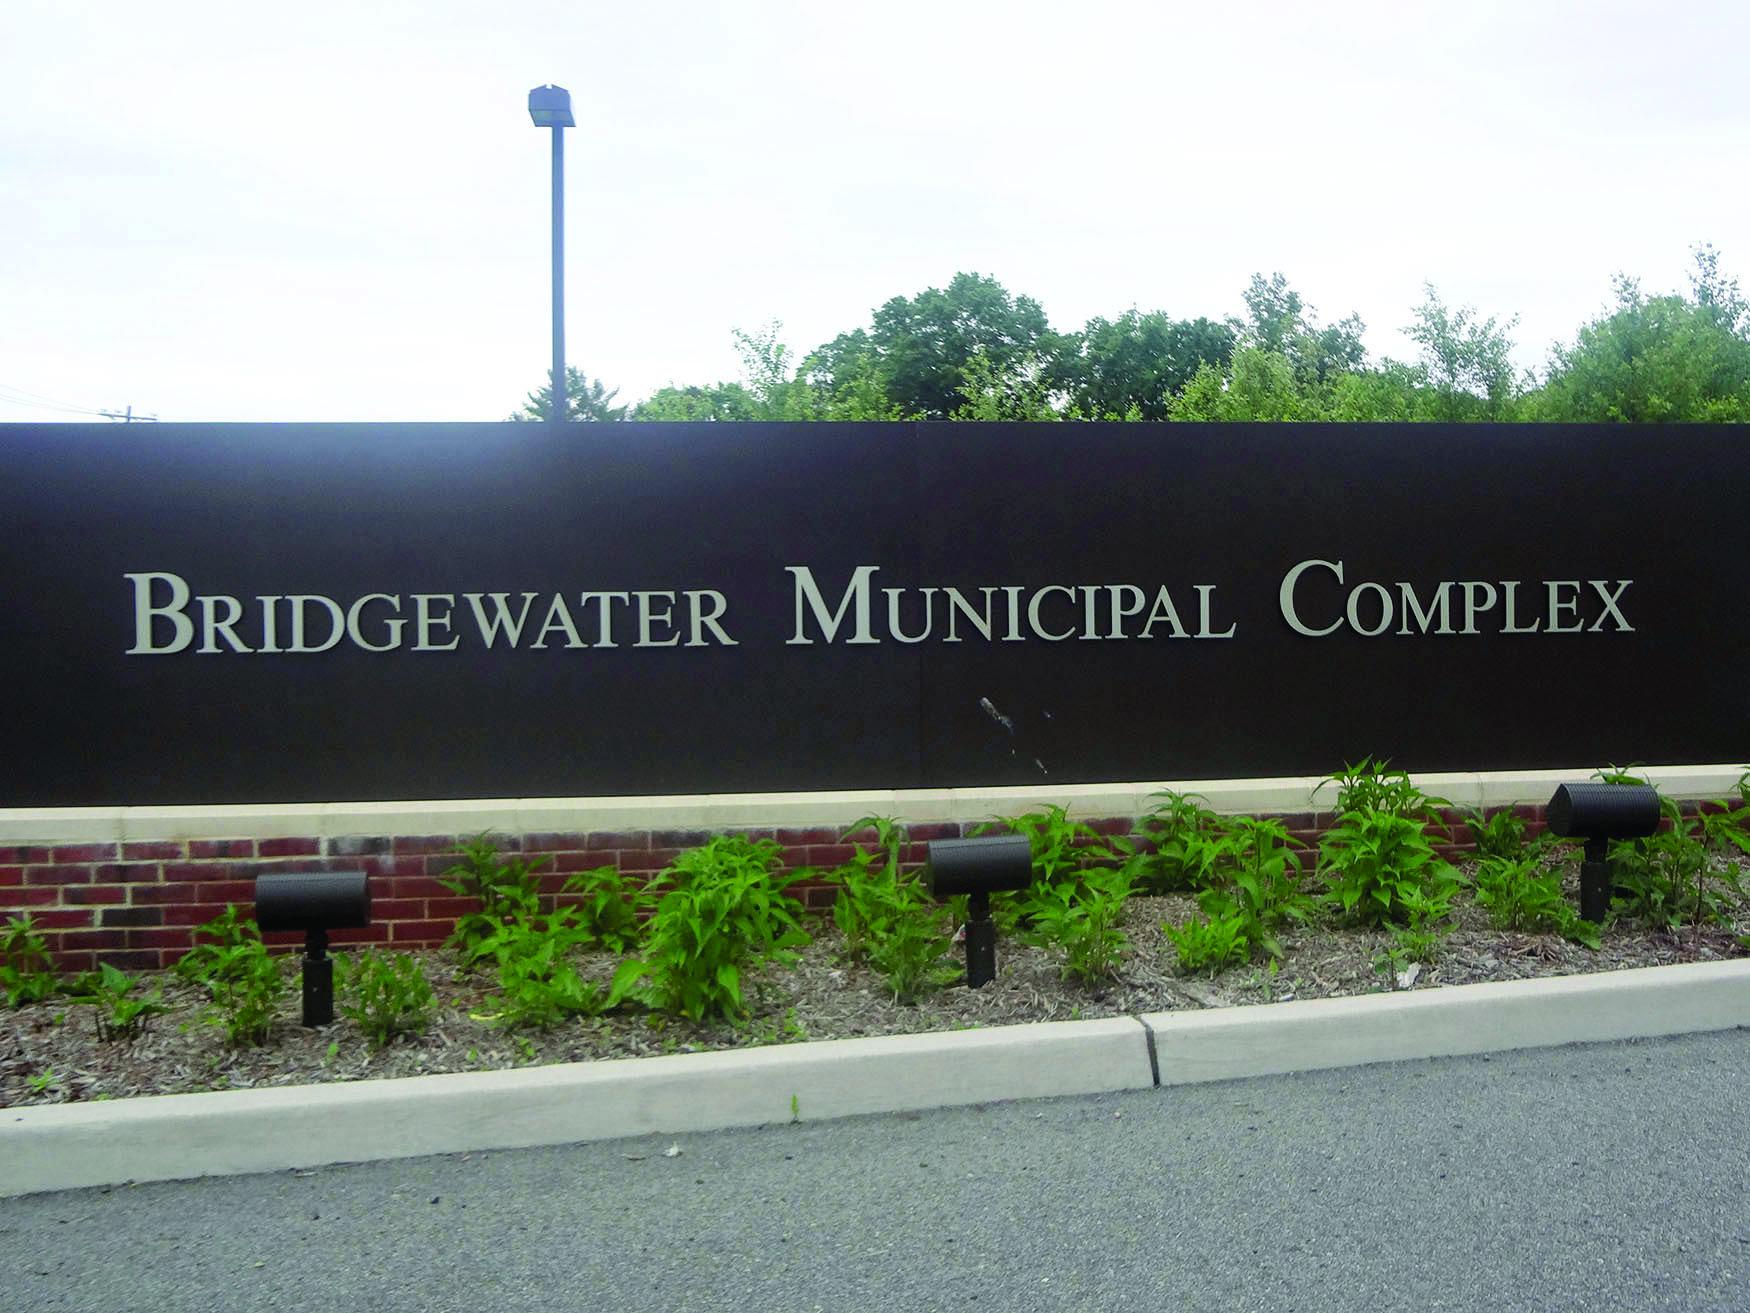 97f198fcca7d05483a0a_Bridgewater_municipal.jpg